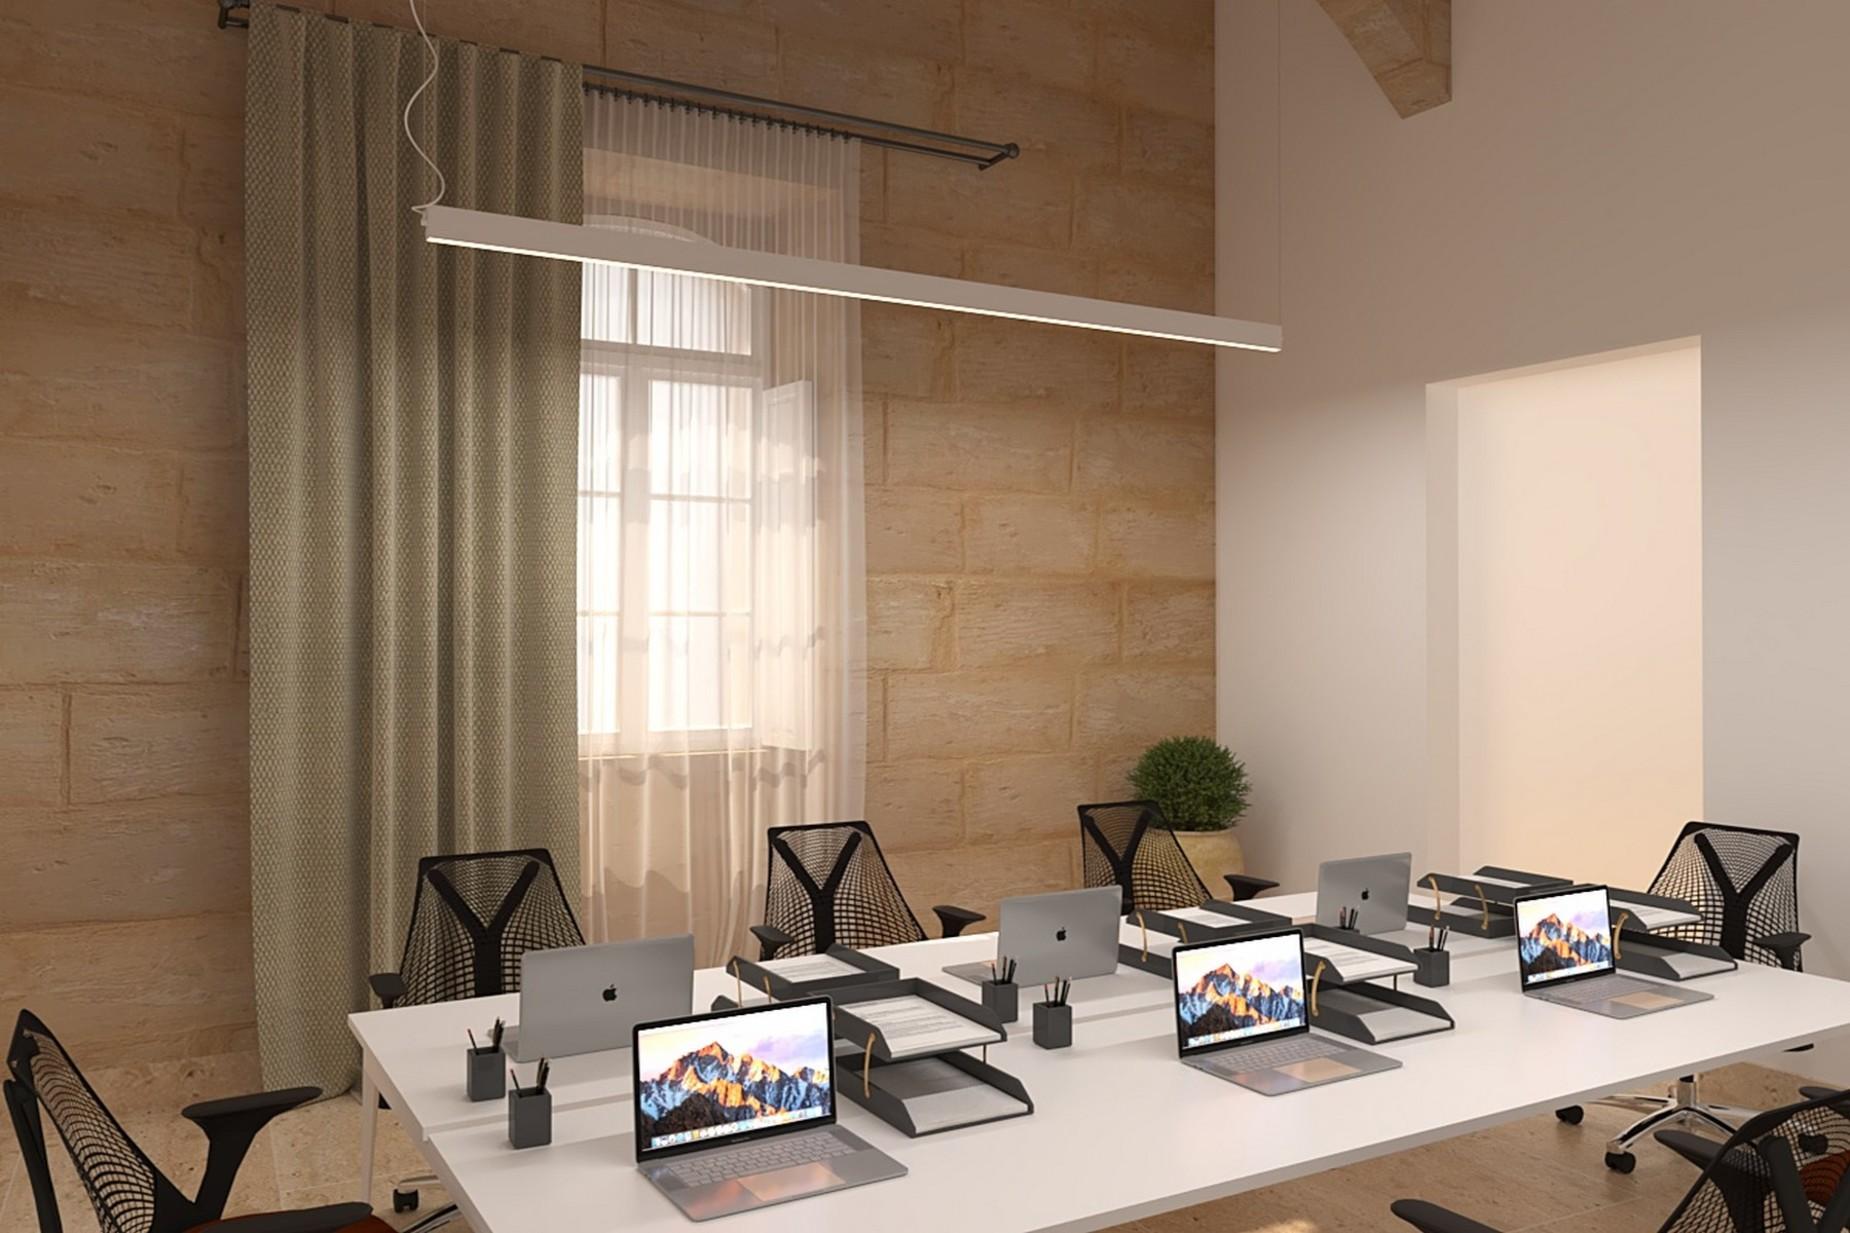 0 bed Office For Rent in Lija, Lija - thumb 9